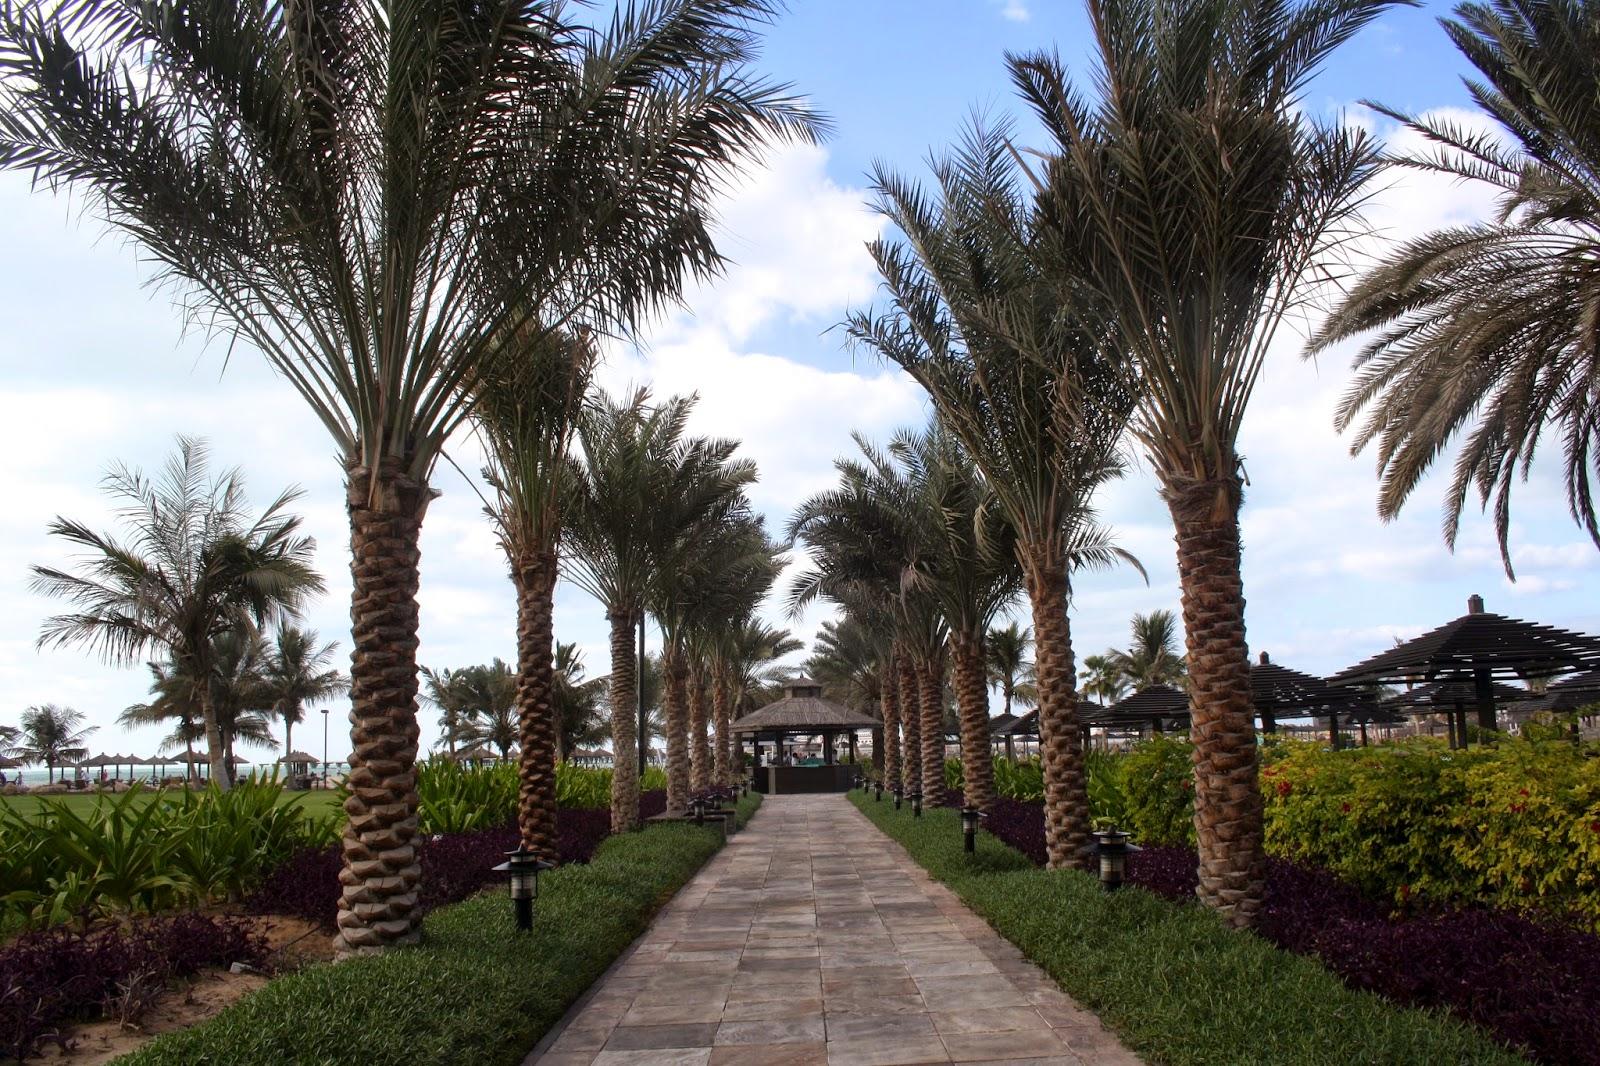 DUBAI PHOTO DIARY I. 29